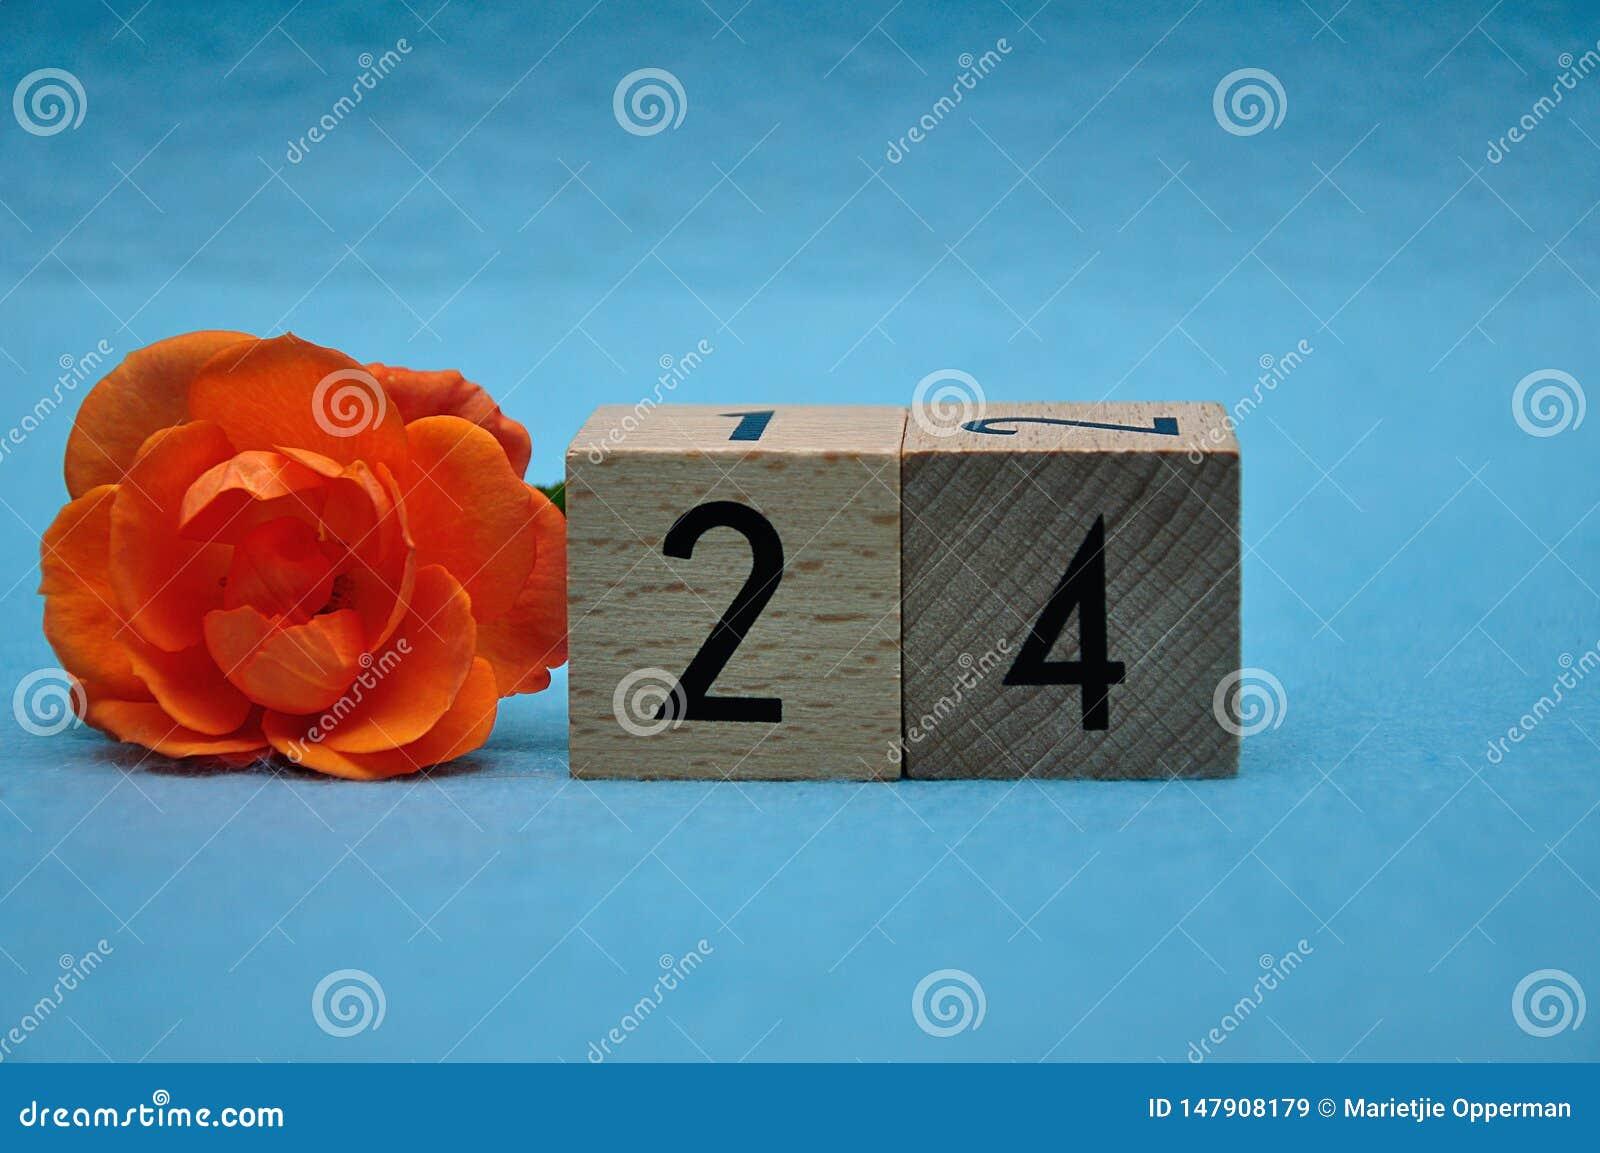 Number twenty four with an orange rose